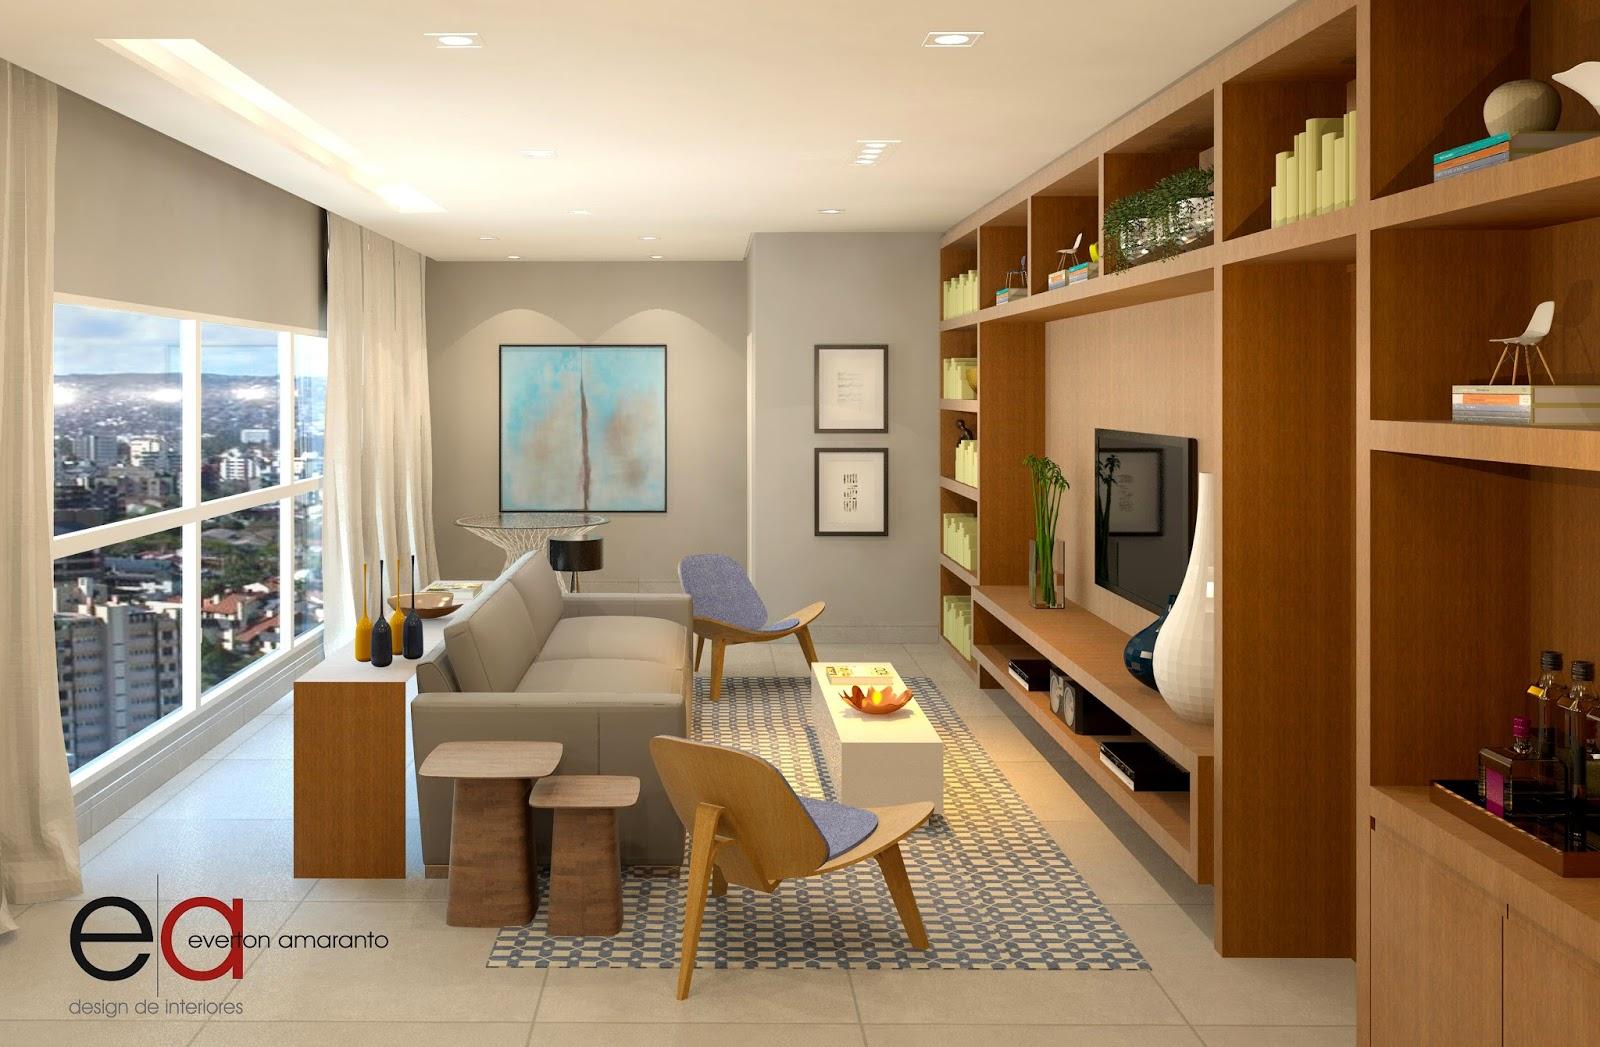 Everton amaranto projeto de interiores curso interiores for De interiores